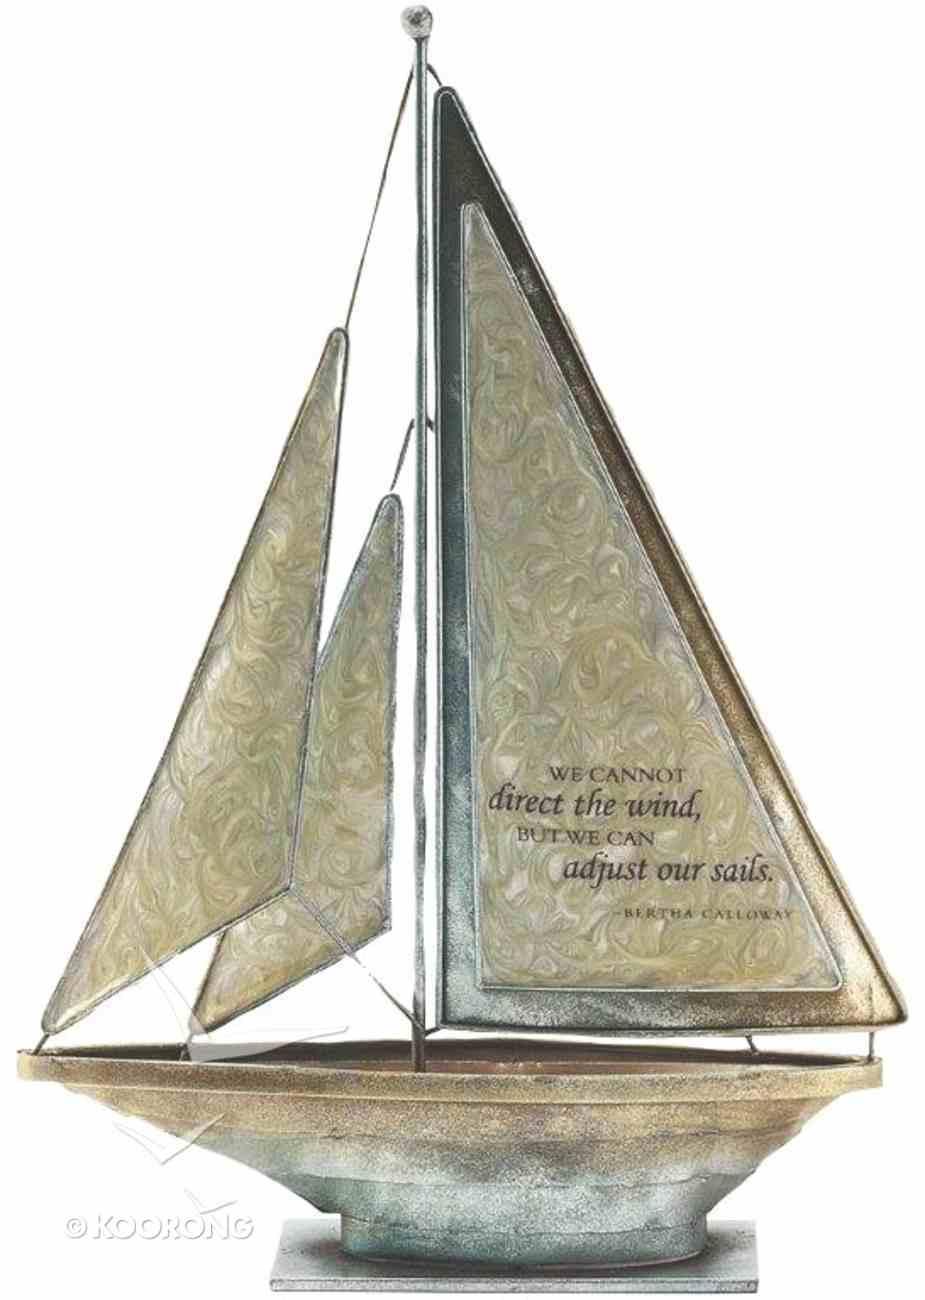 Sailboat Metal: We Cannot Direct the Wind 'Bertha Calloway' (Cream) Homeware